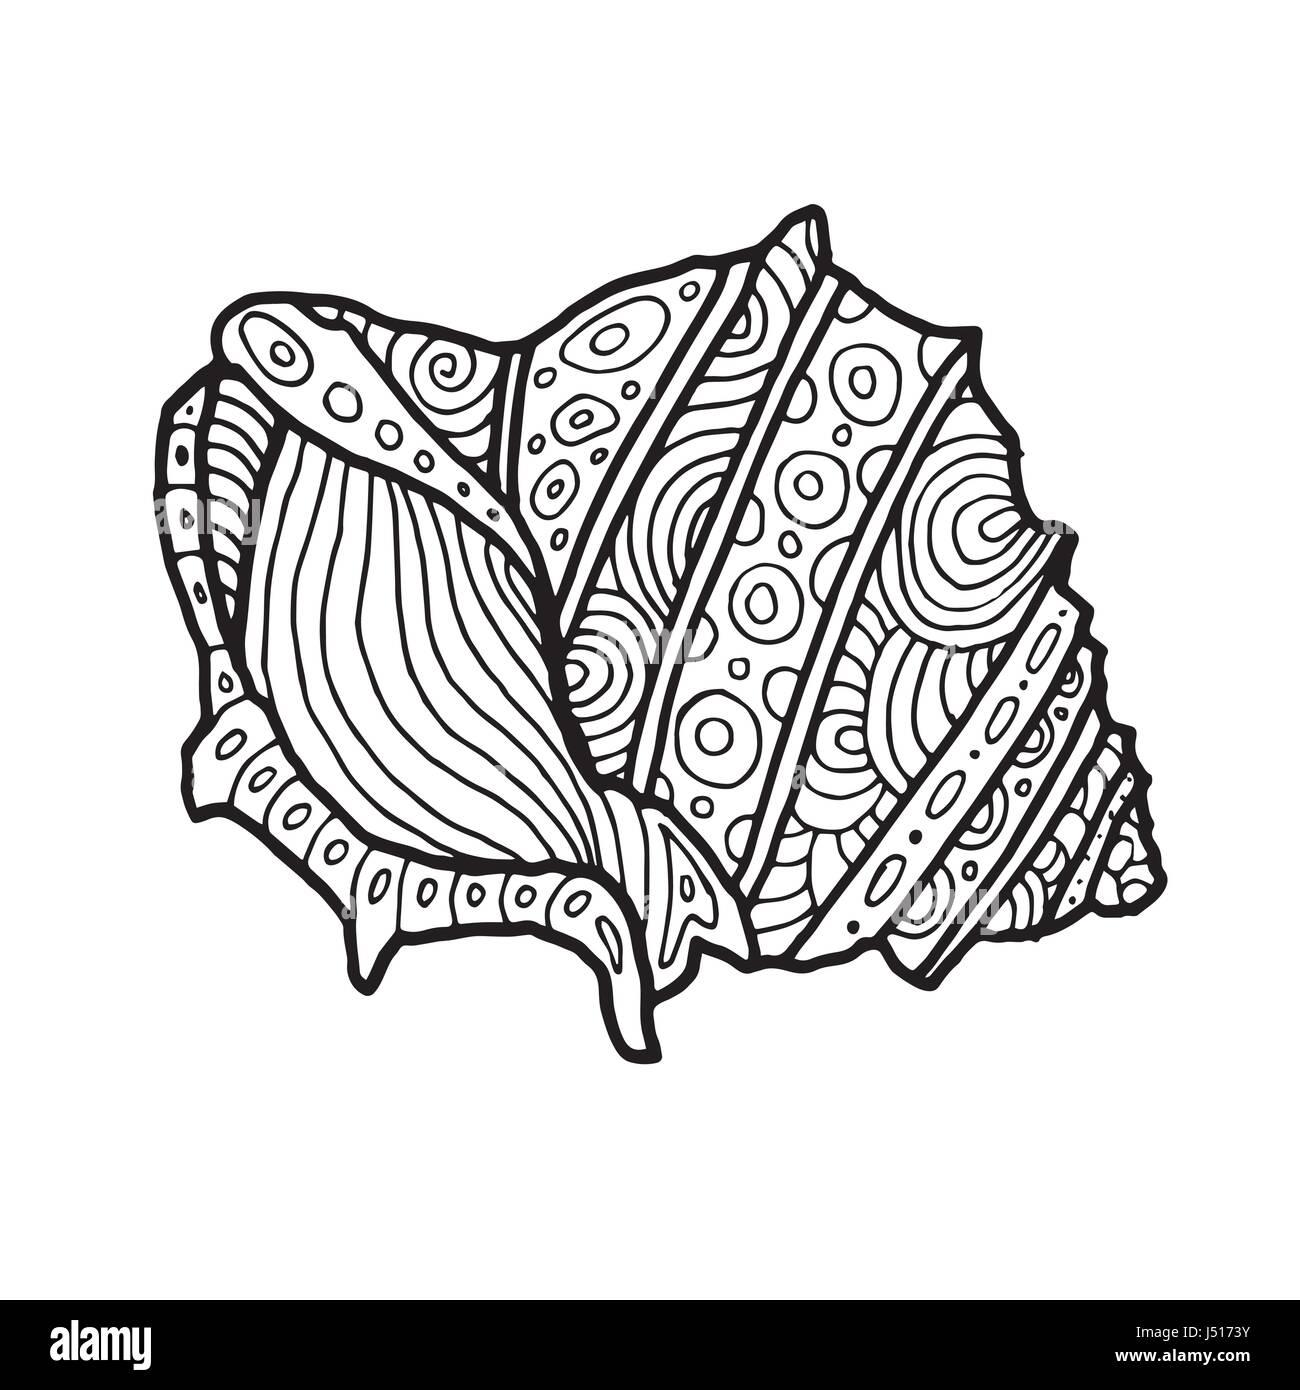 Dekorative Zentangle Sea Shell Abbildung. Umrisszeichnung. Malbuch ...